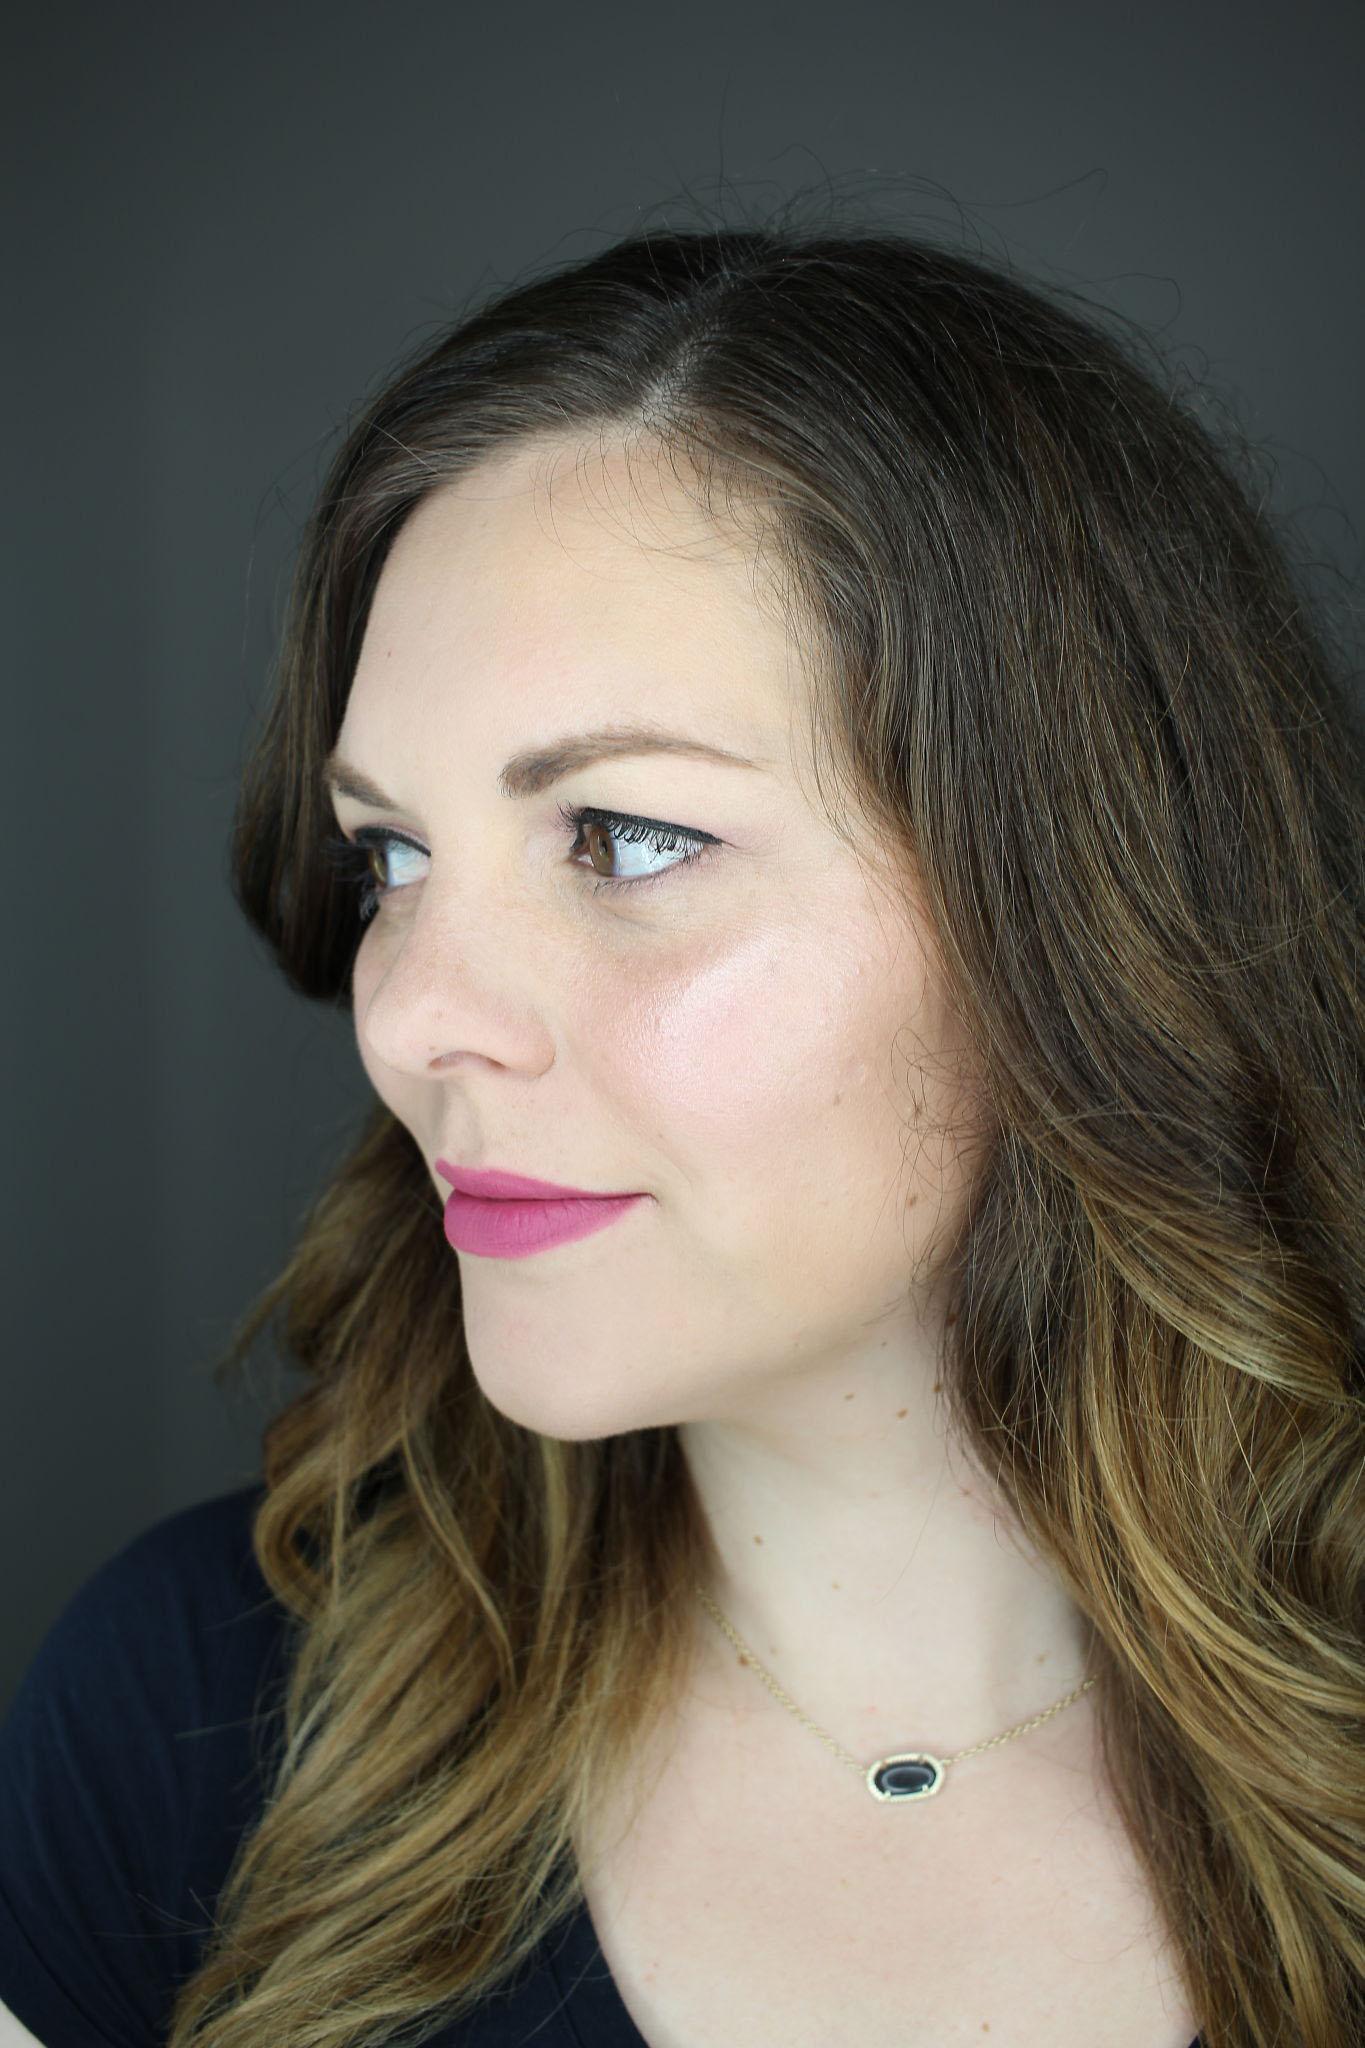 Anastasia Glow Kit in Gleam 2